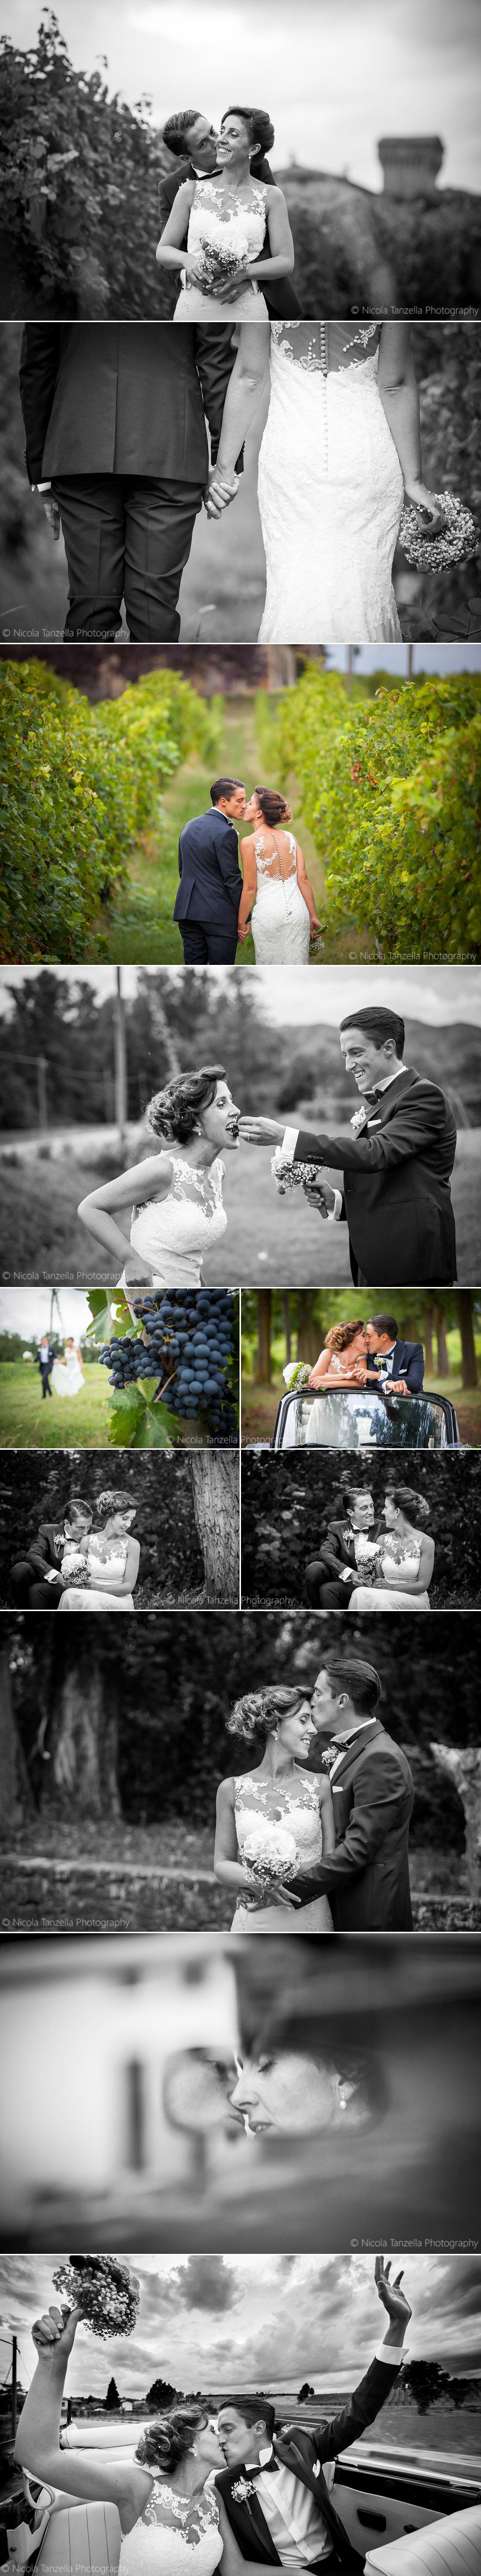 fotografo matrimonio parma-9